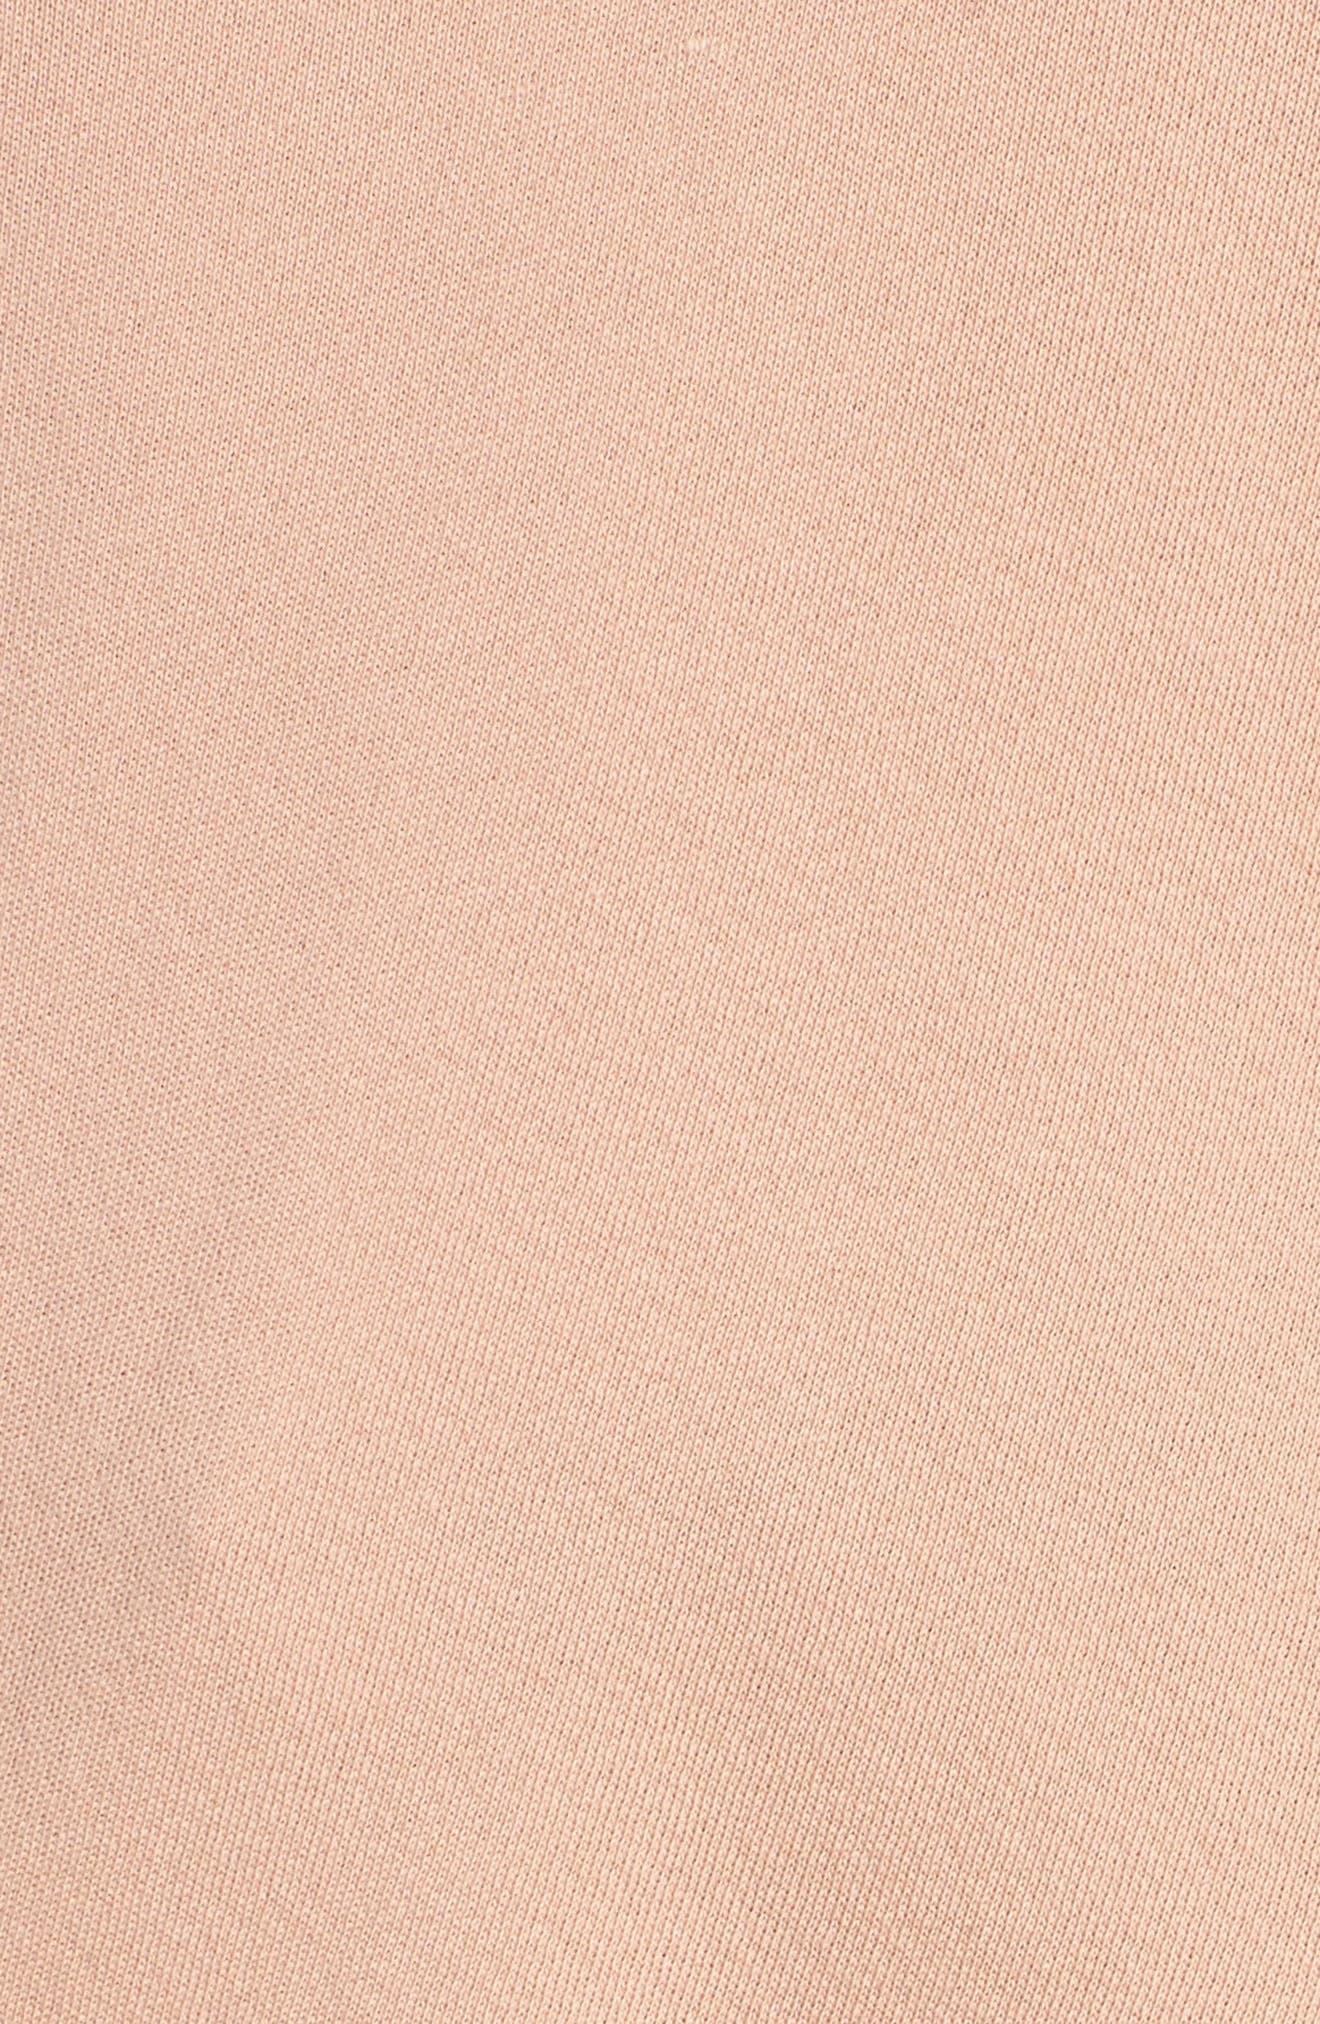 Alternate Image 5  - Current/Elliott The Slouchy Ruffle Sweatshirt